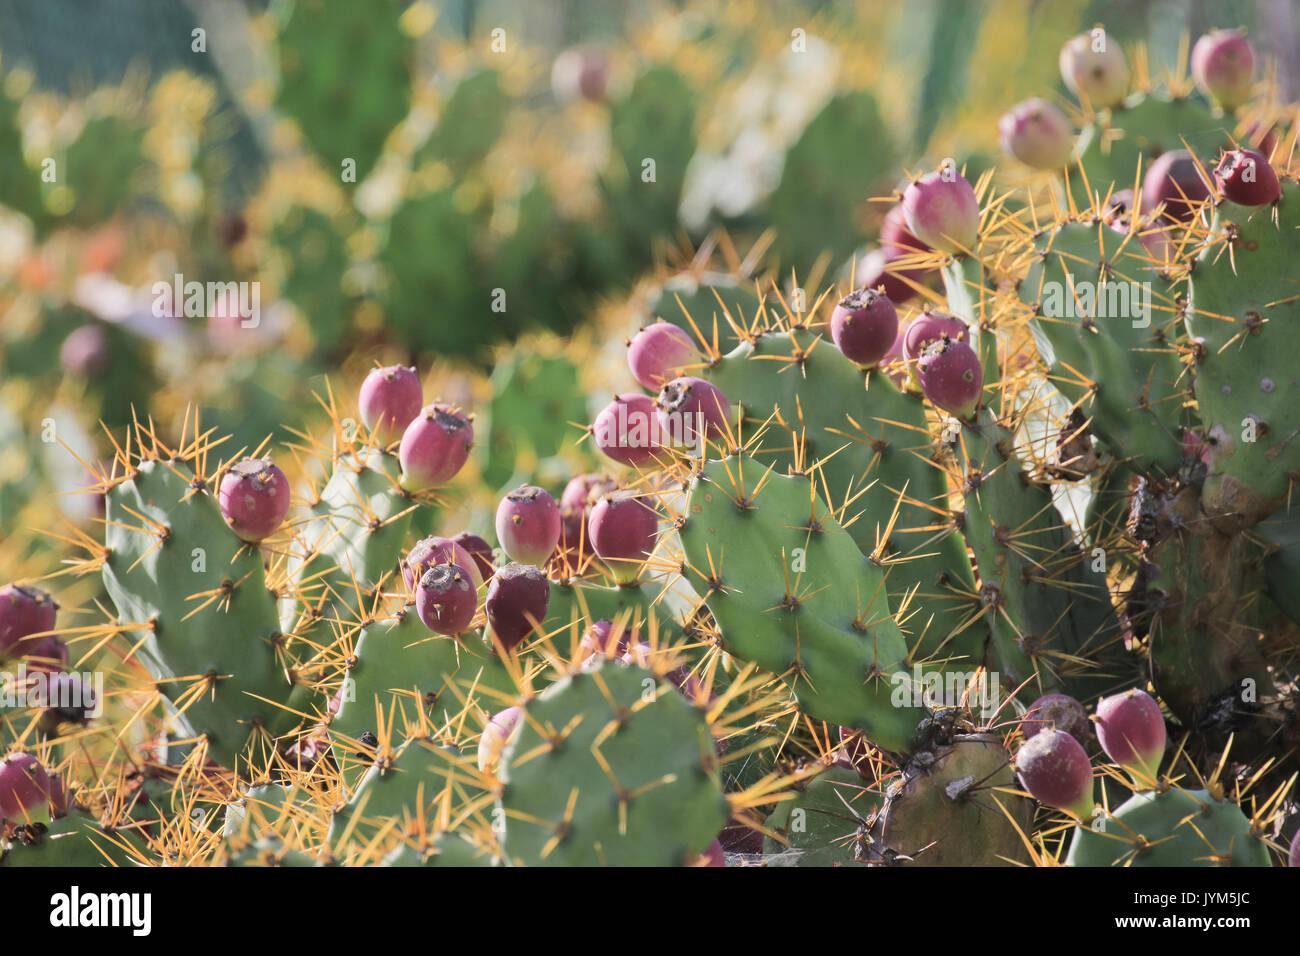 Prickly pear, opuntia, cactus - Stock Image